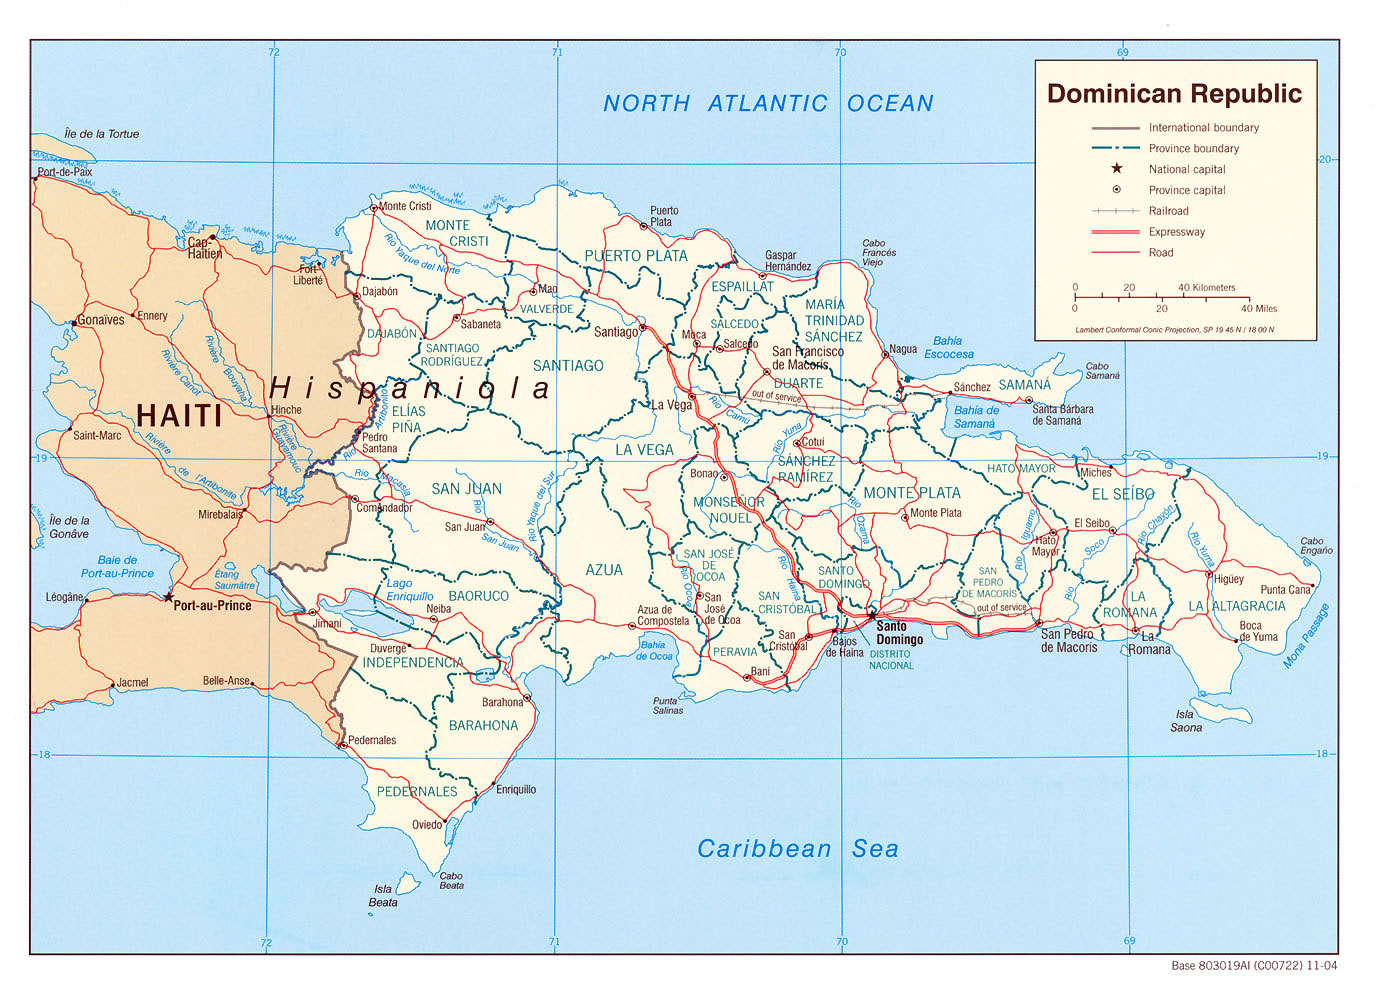 République dominicaine, République dominicaine